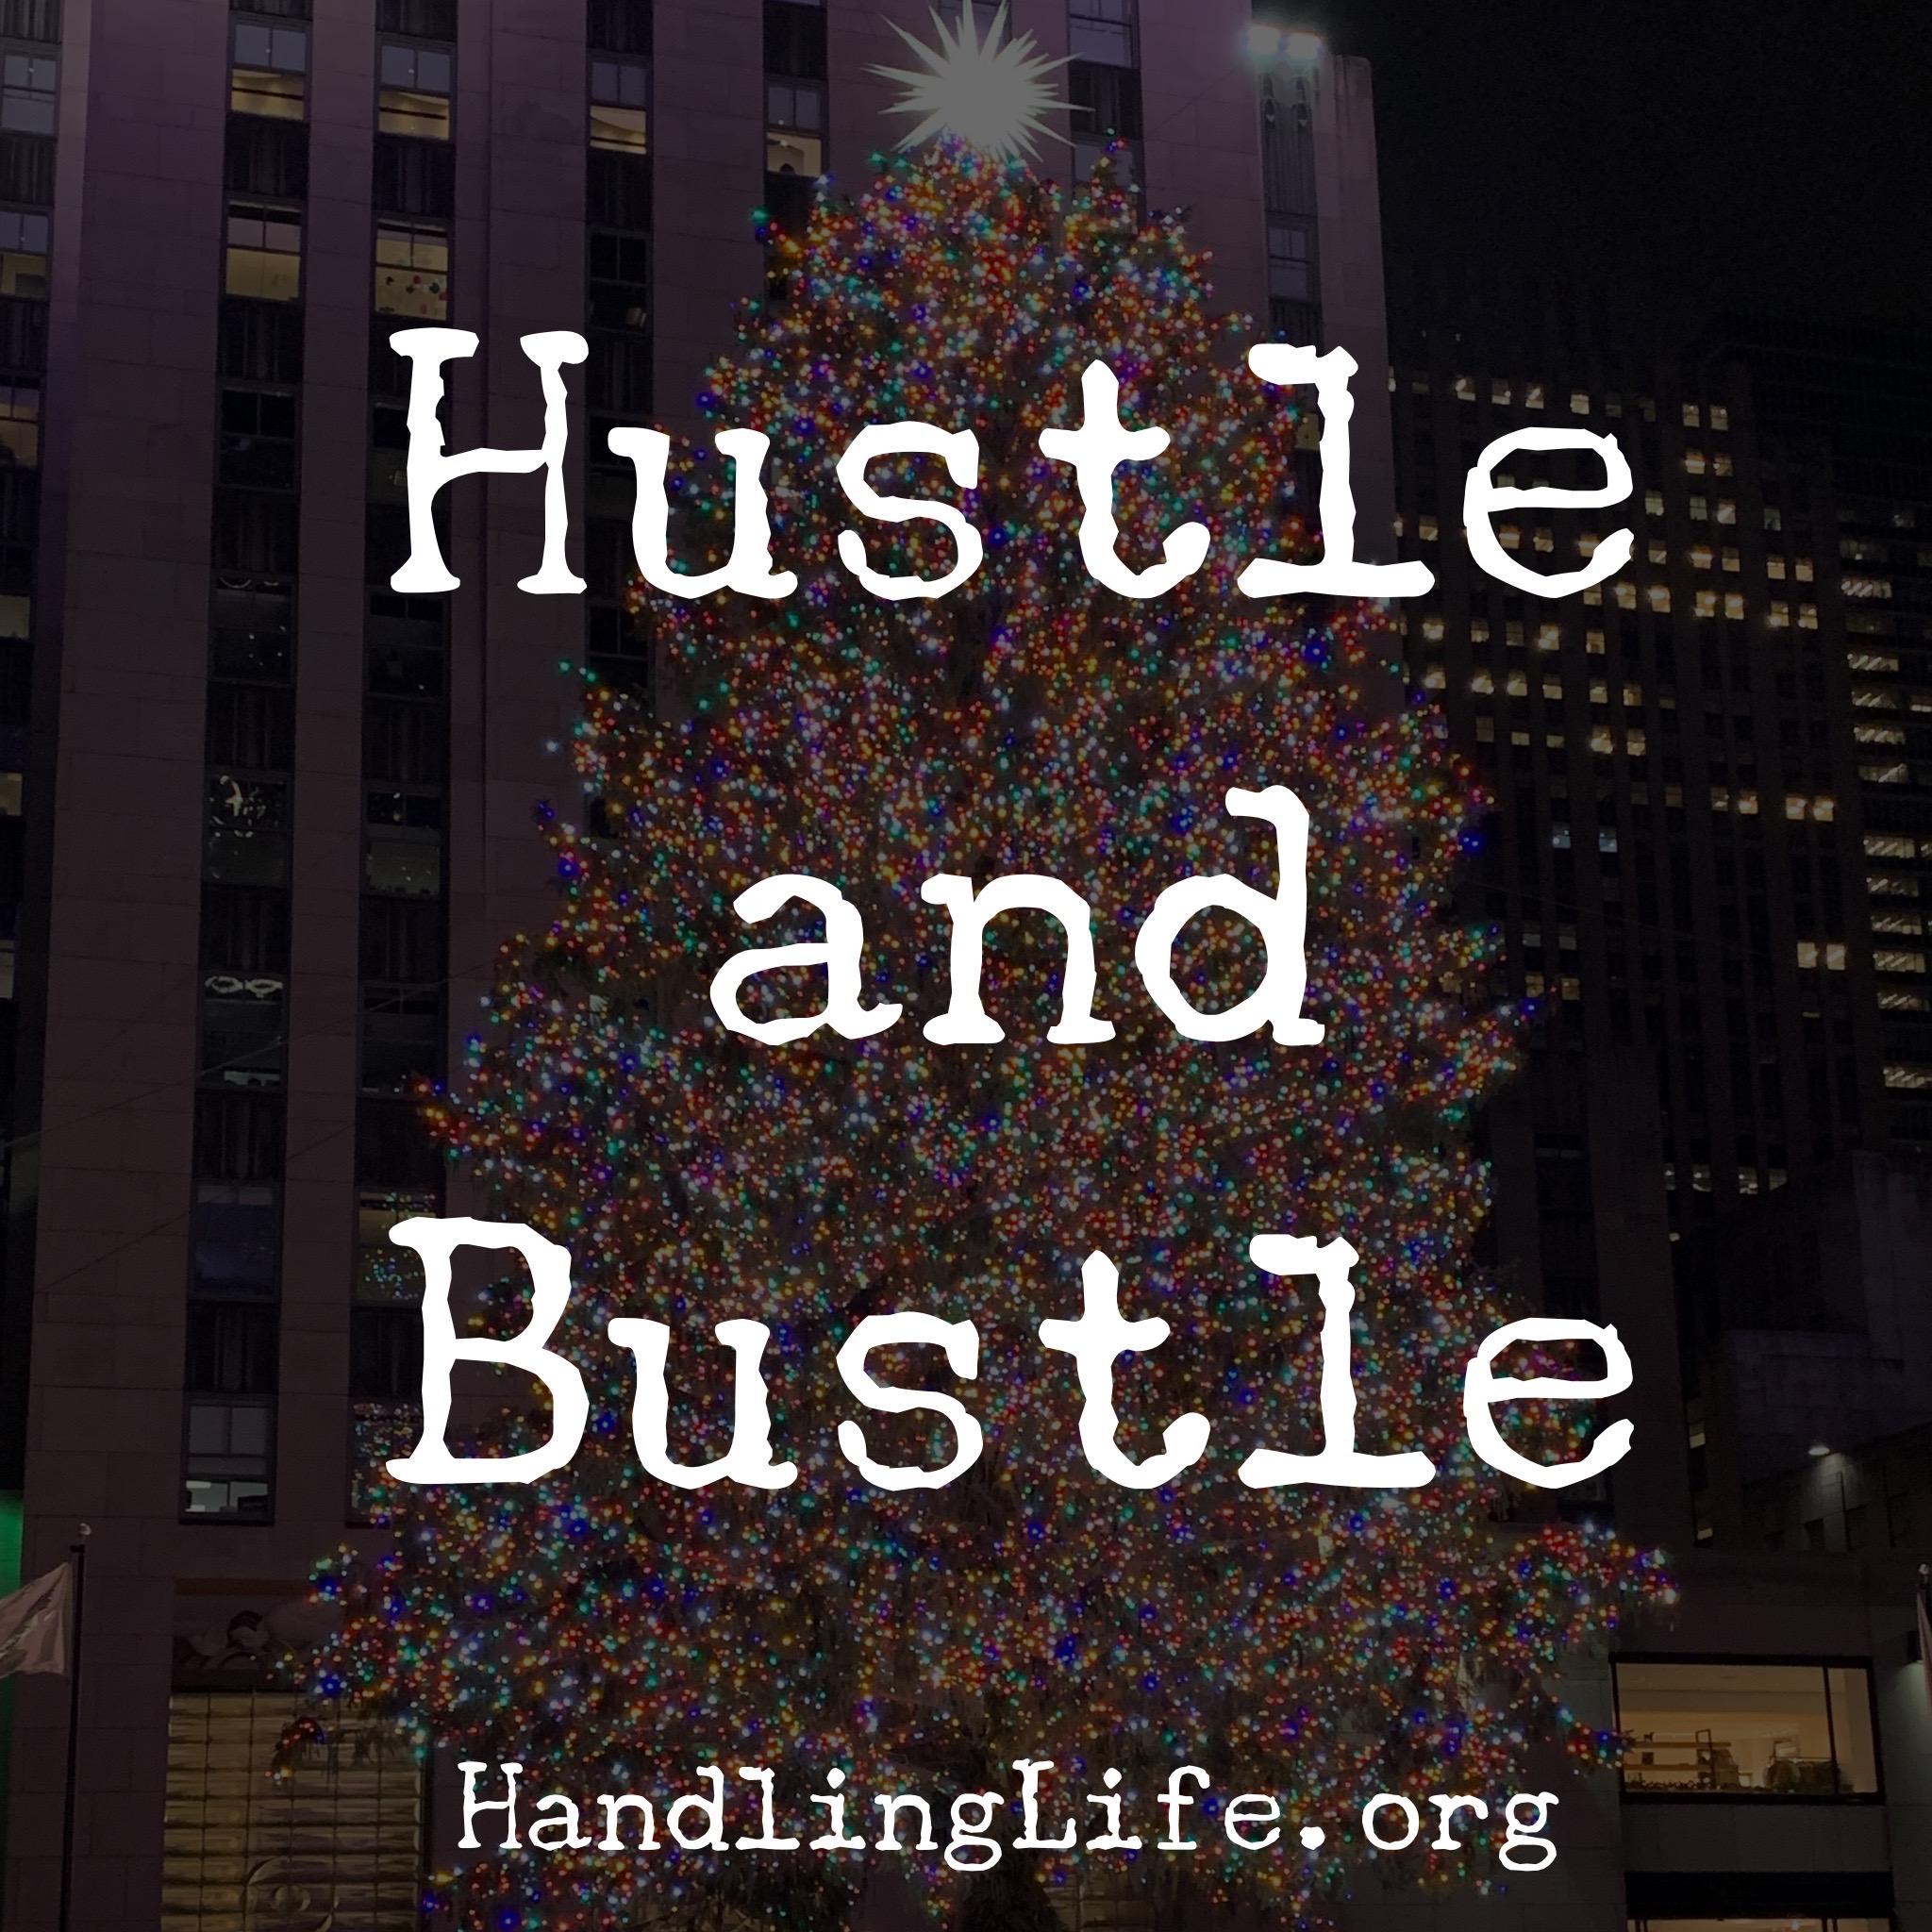 Artwork for Hustle and Bustle